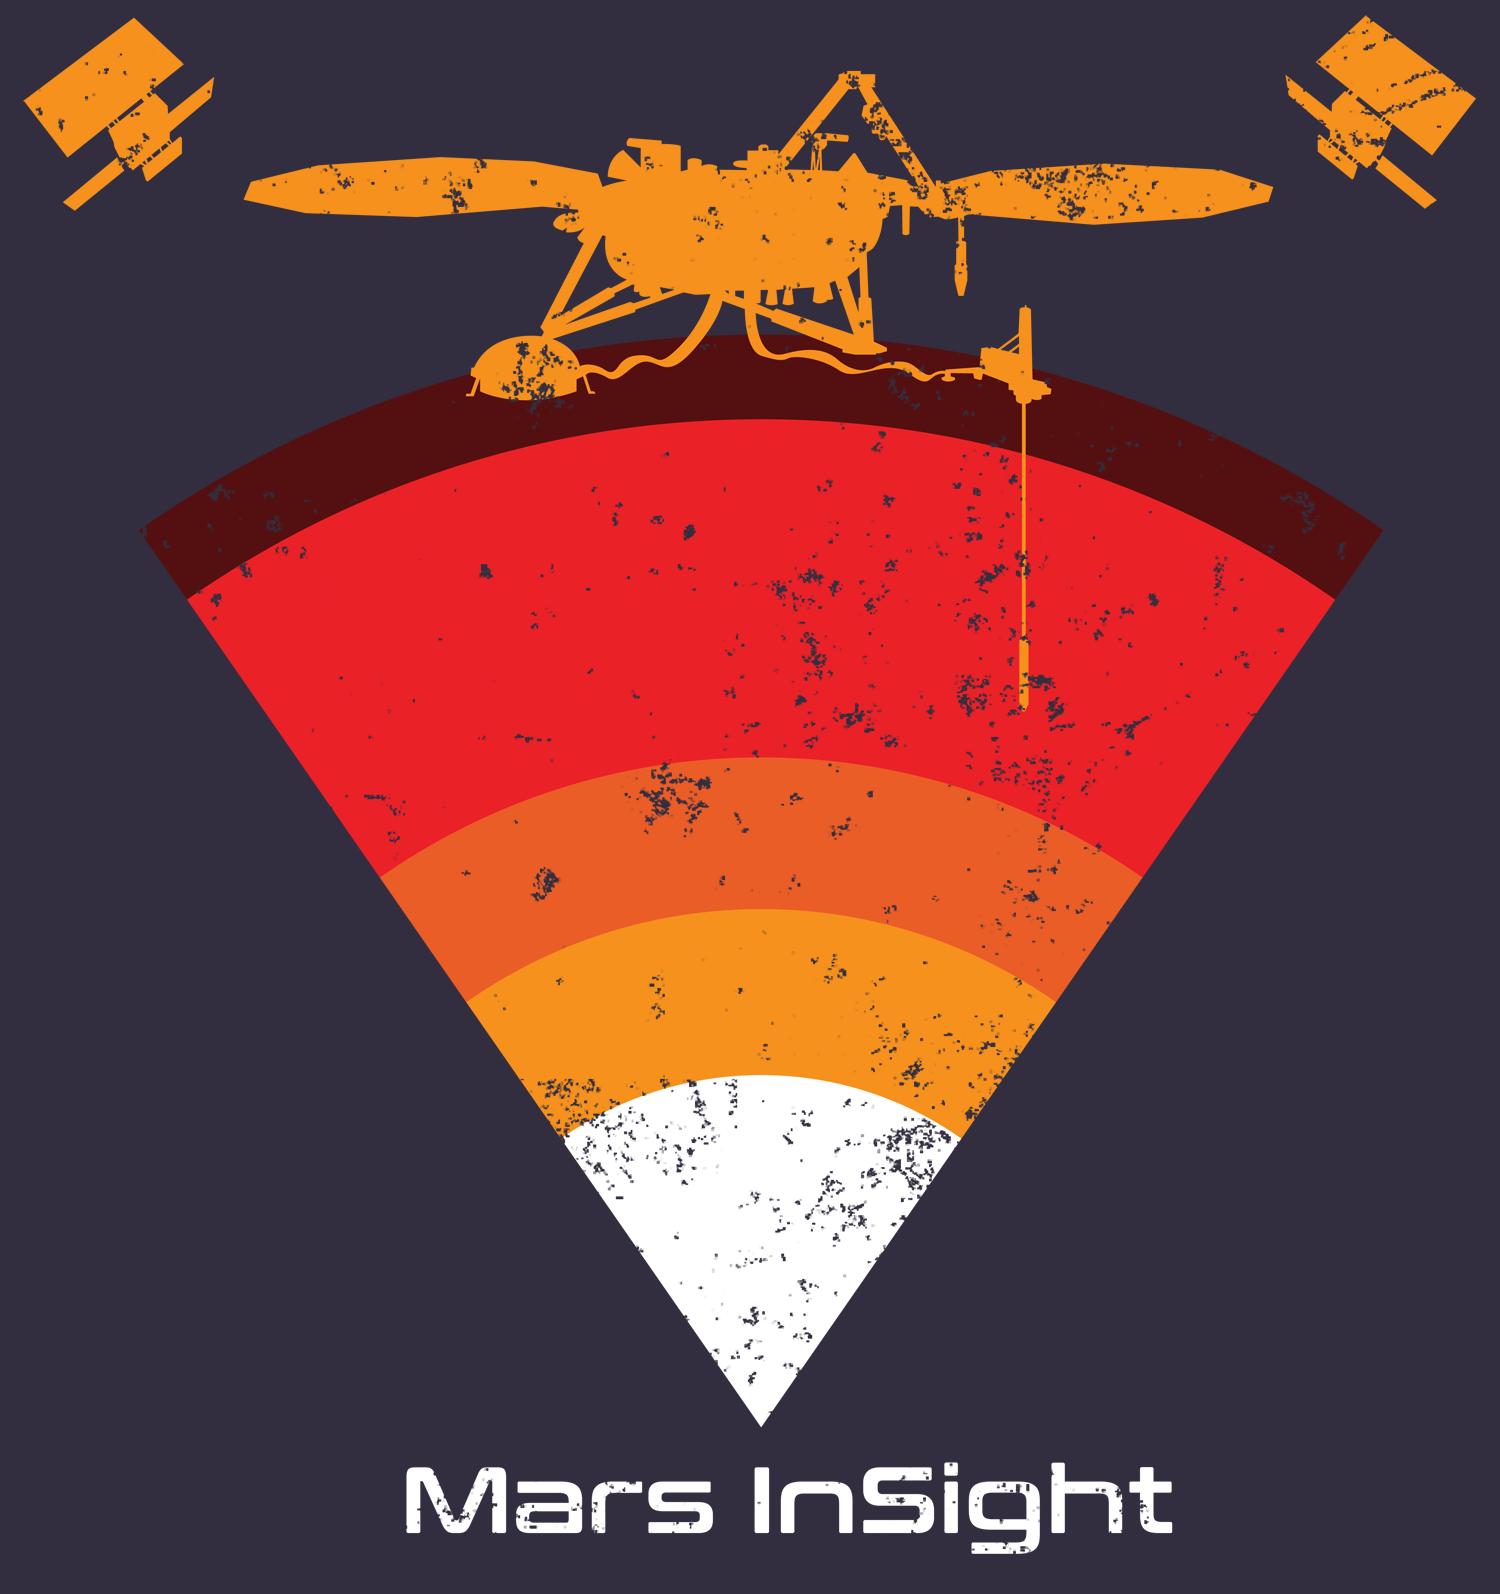 Mars InSight & MarCo Cubesat Design